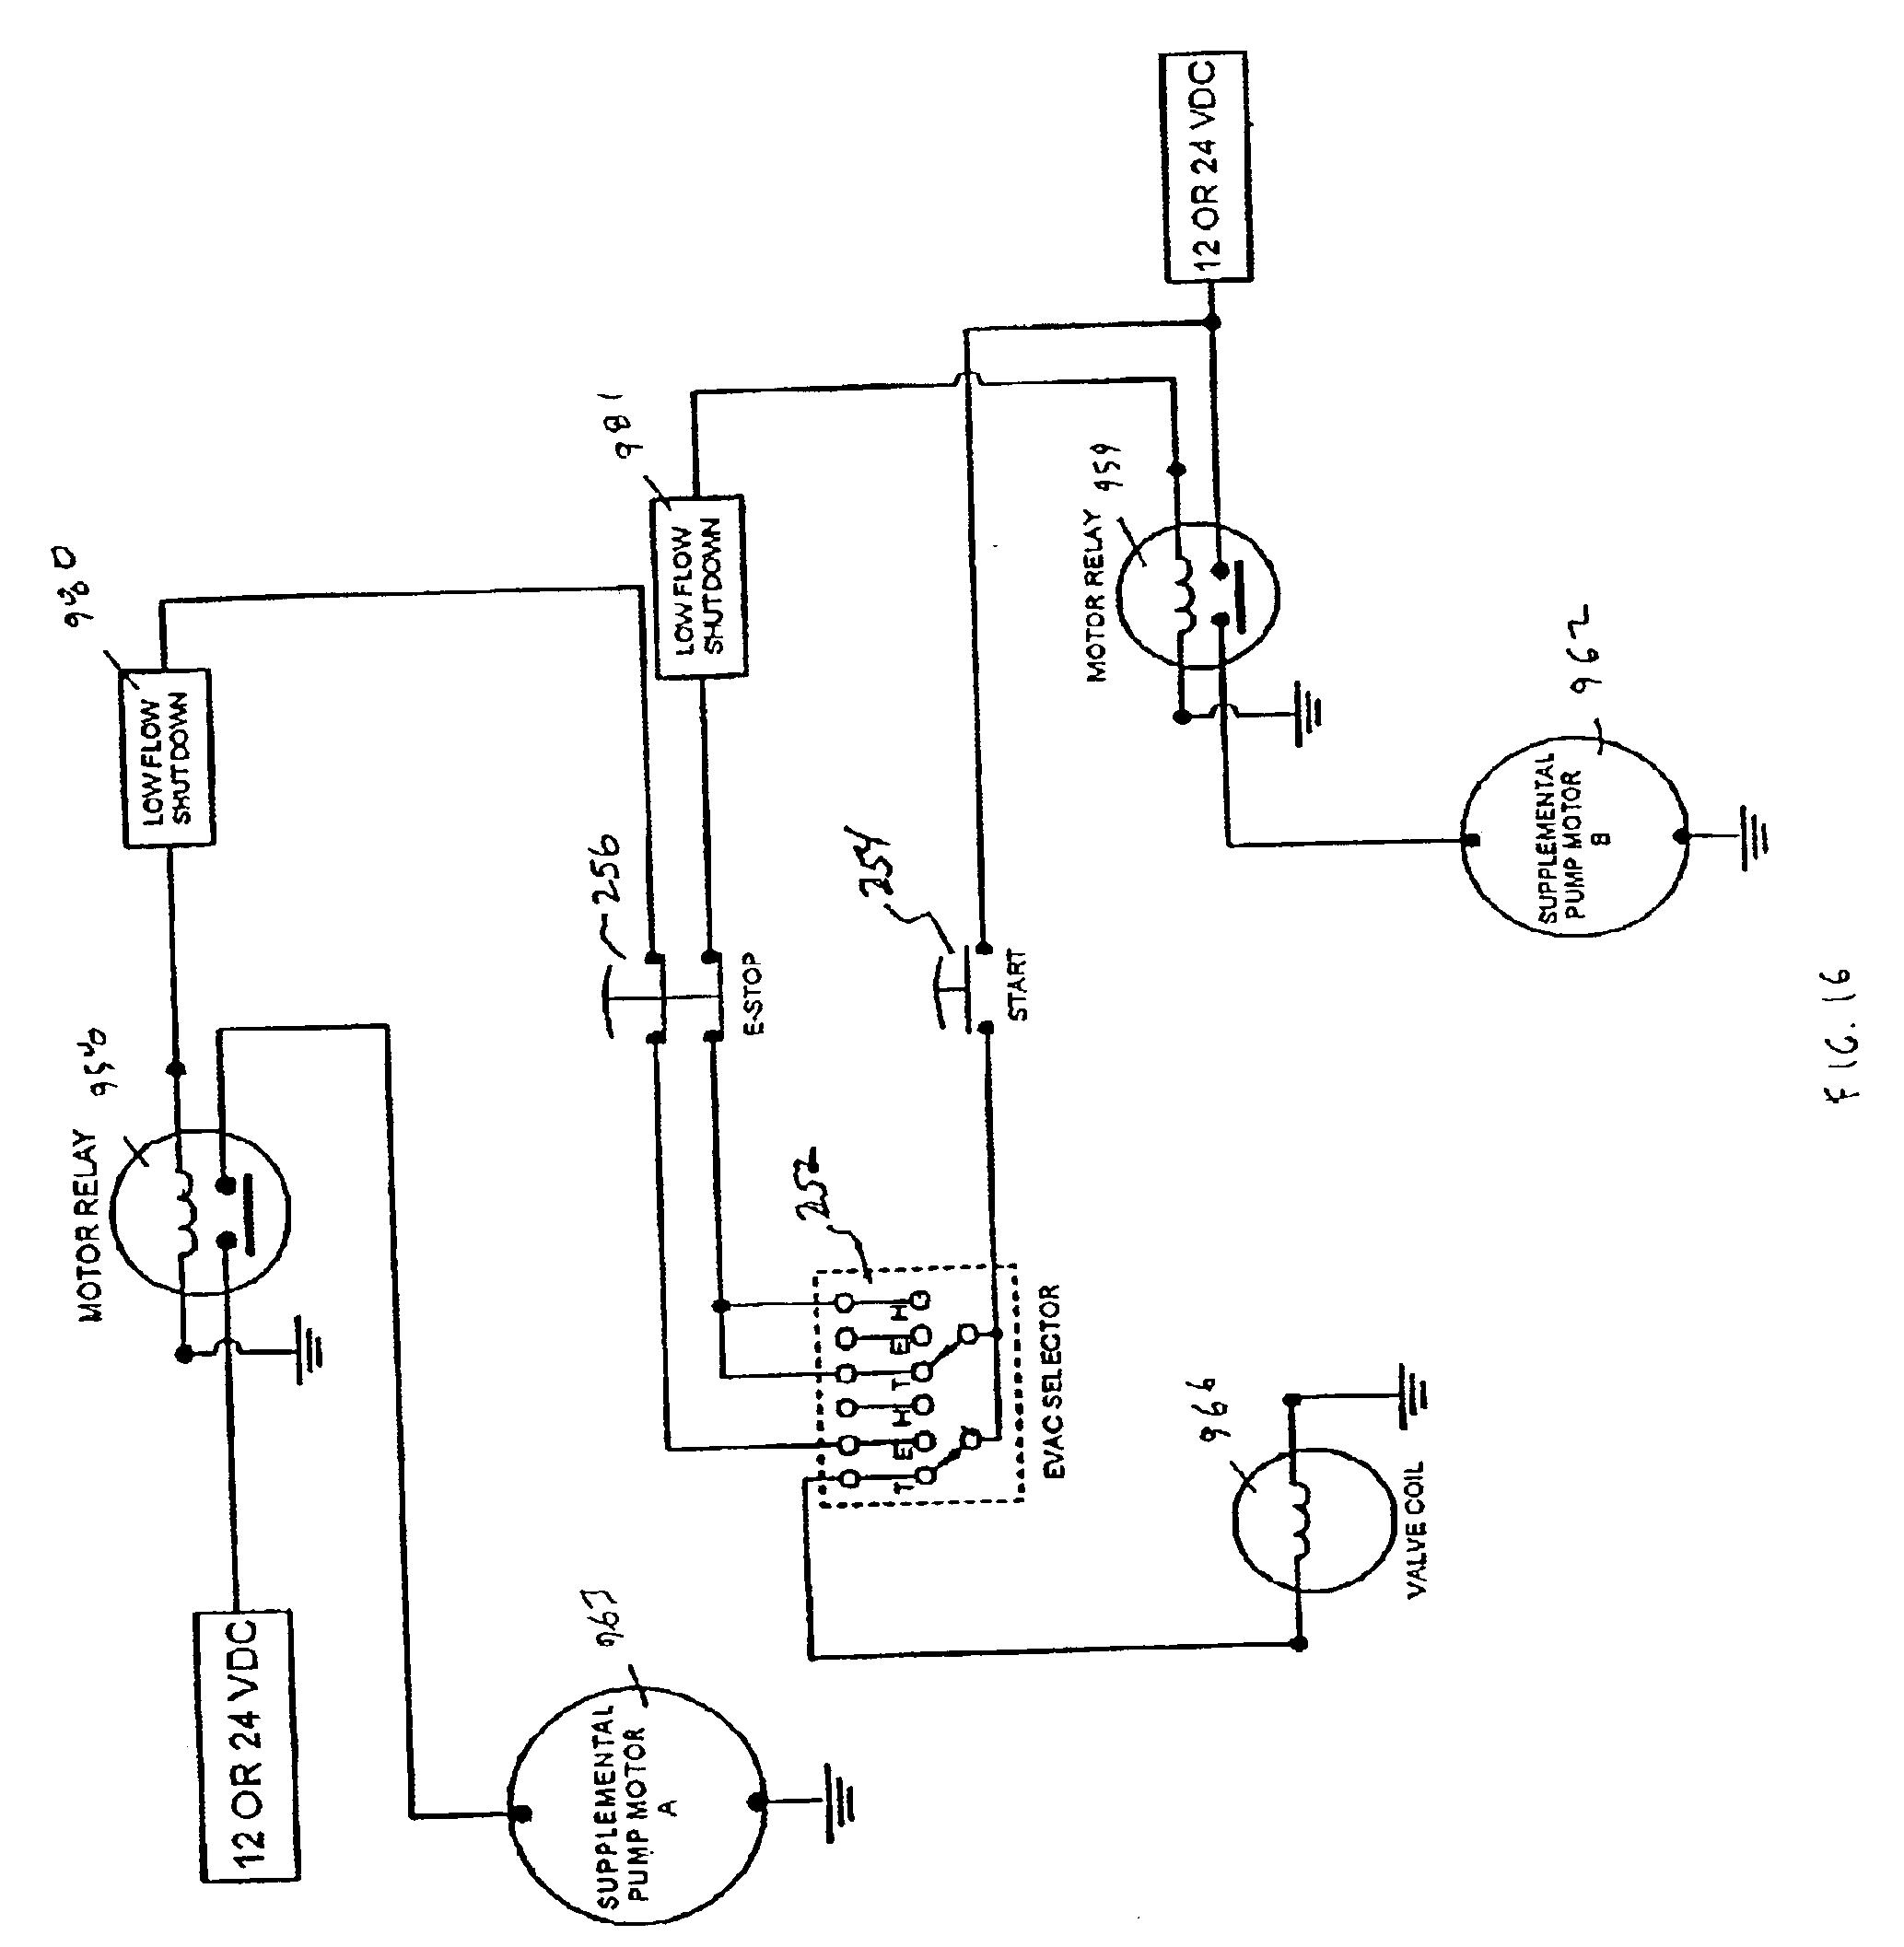 Yamaha Rhino Ignition Wiring Diagram Diagram Auto Wiring